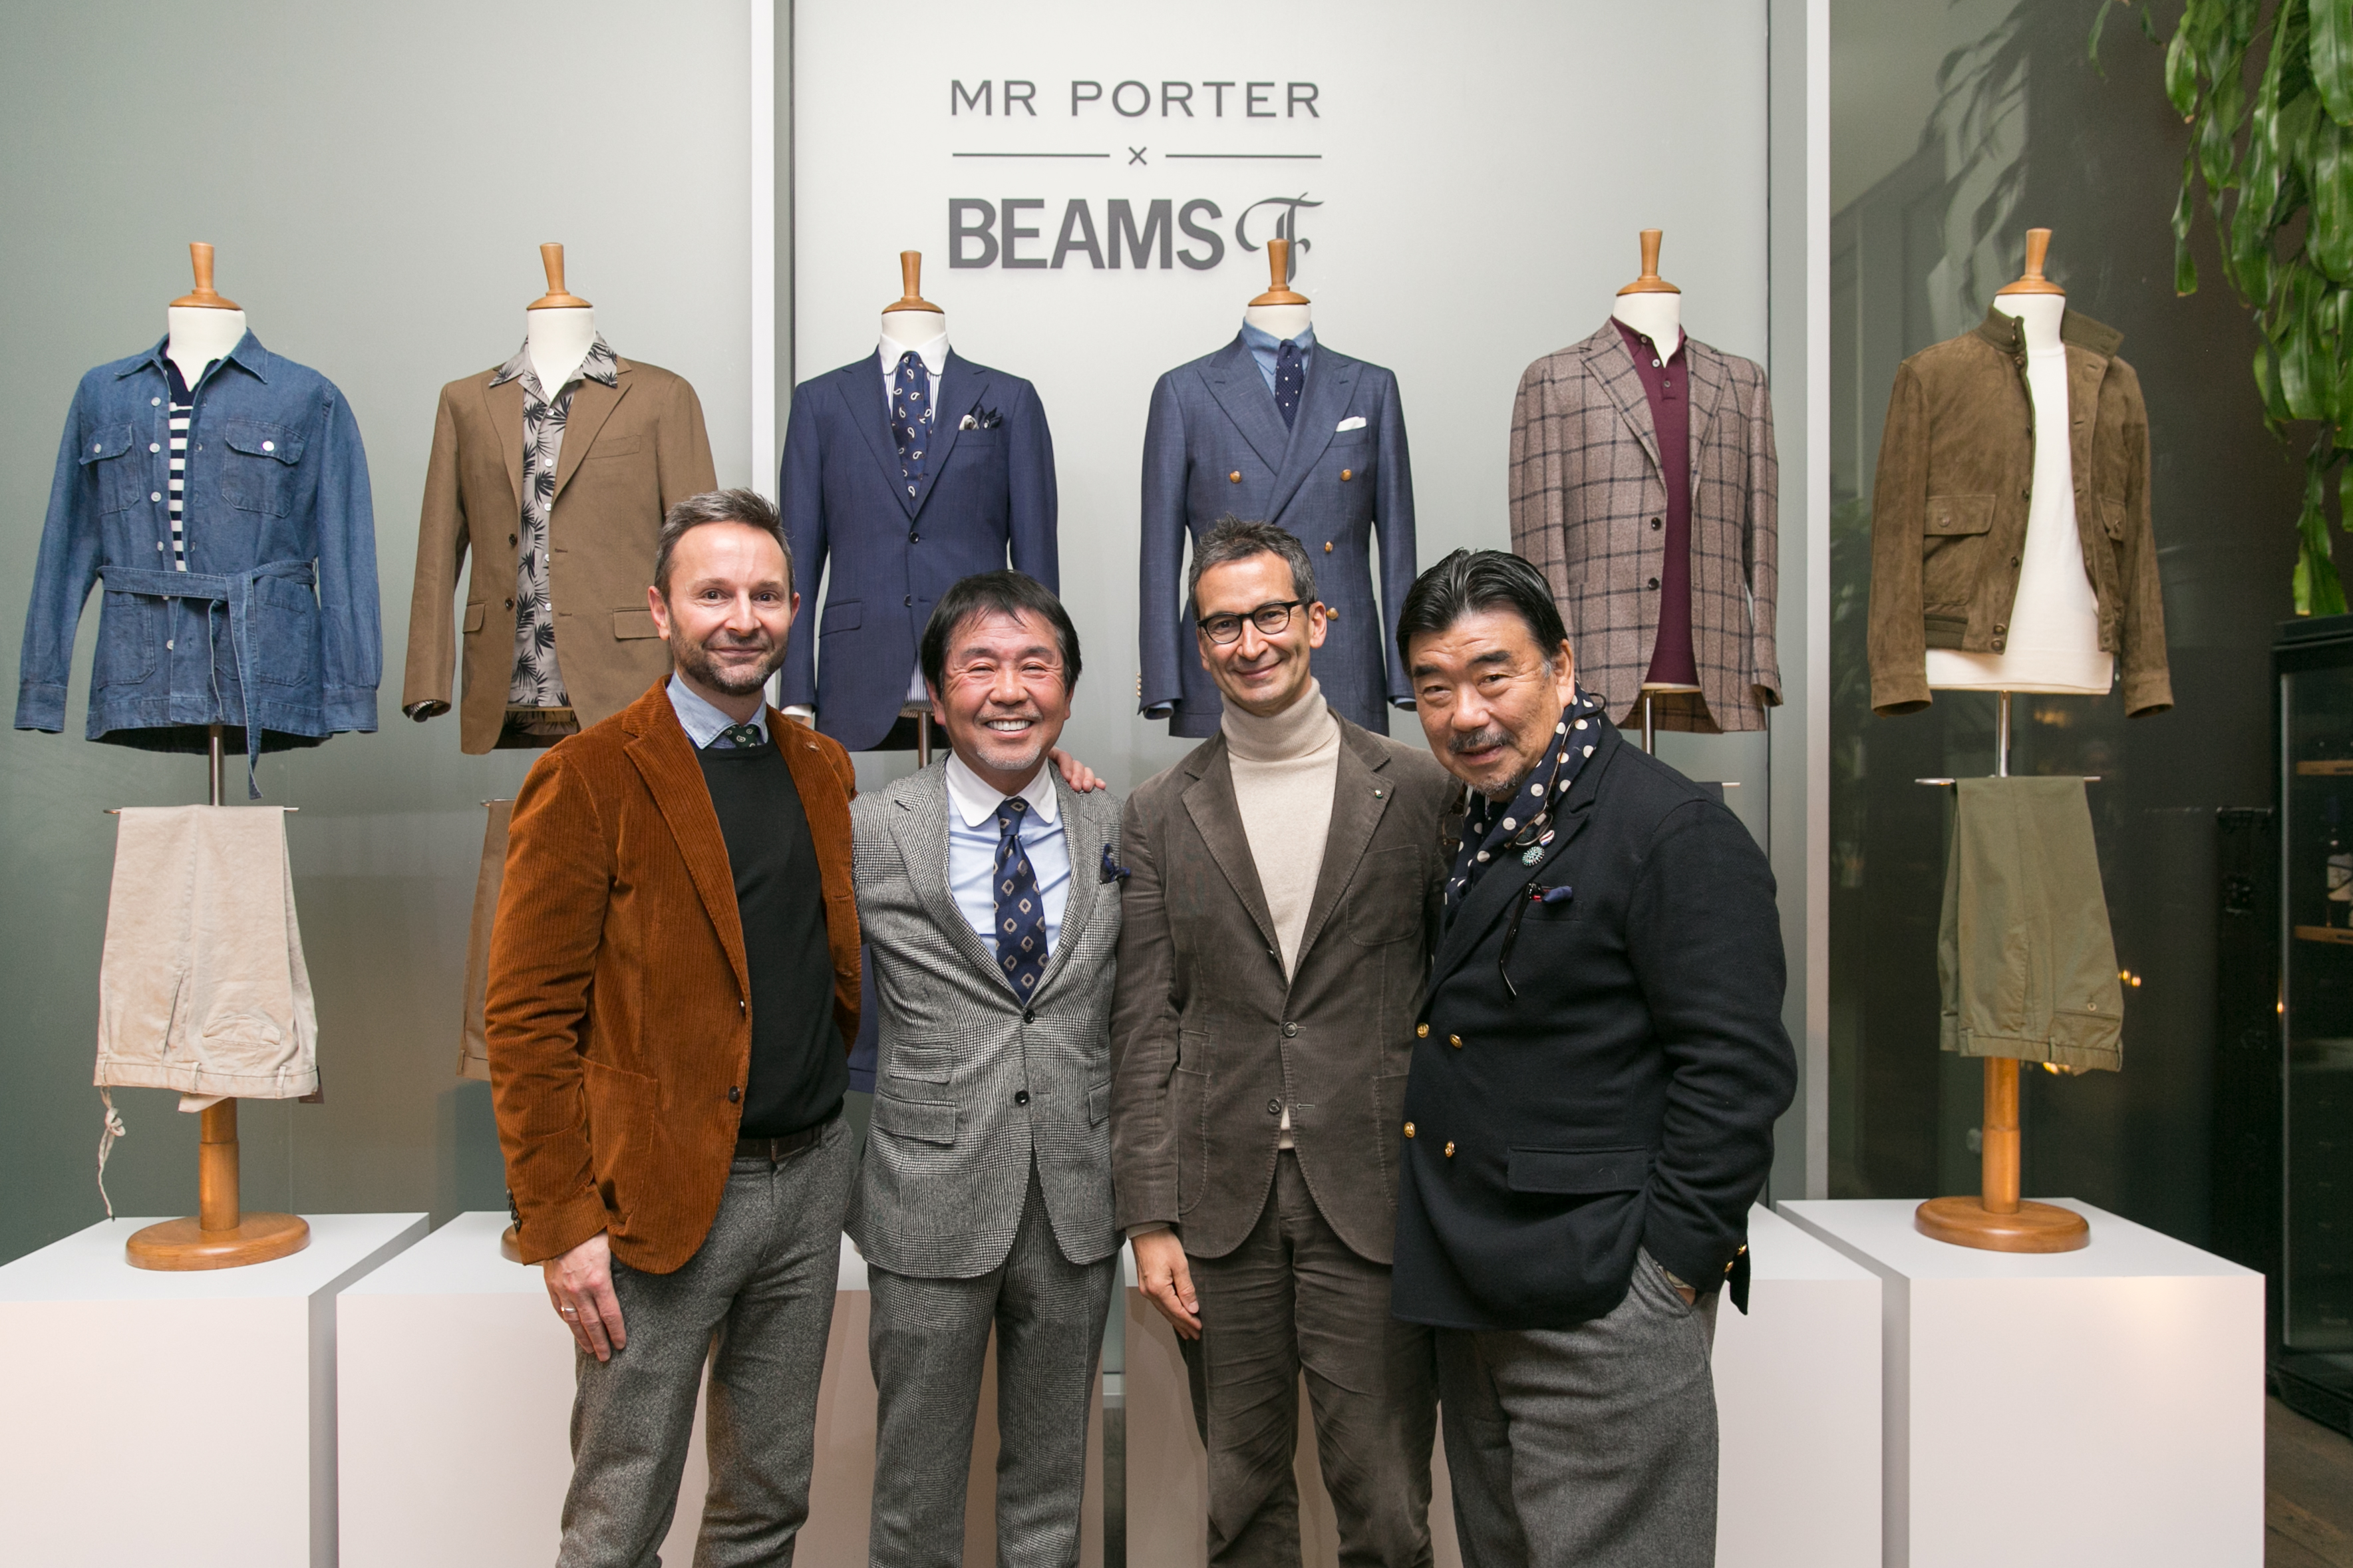 Mr Porter's Jeremy Langmead, Beams' ceo Yo Shitara, Yoox Net-A-Porter ceo Federico Marchetti and Beams' VP Keishi Endo.